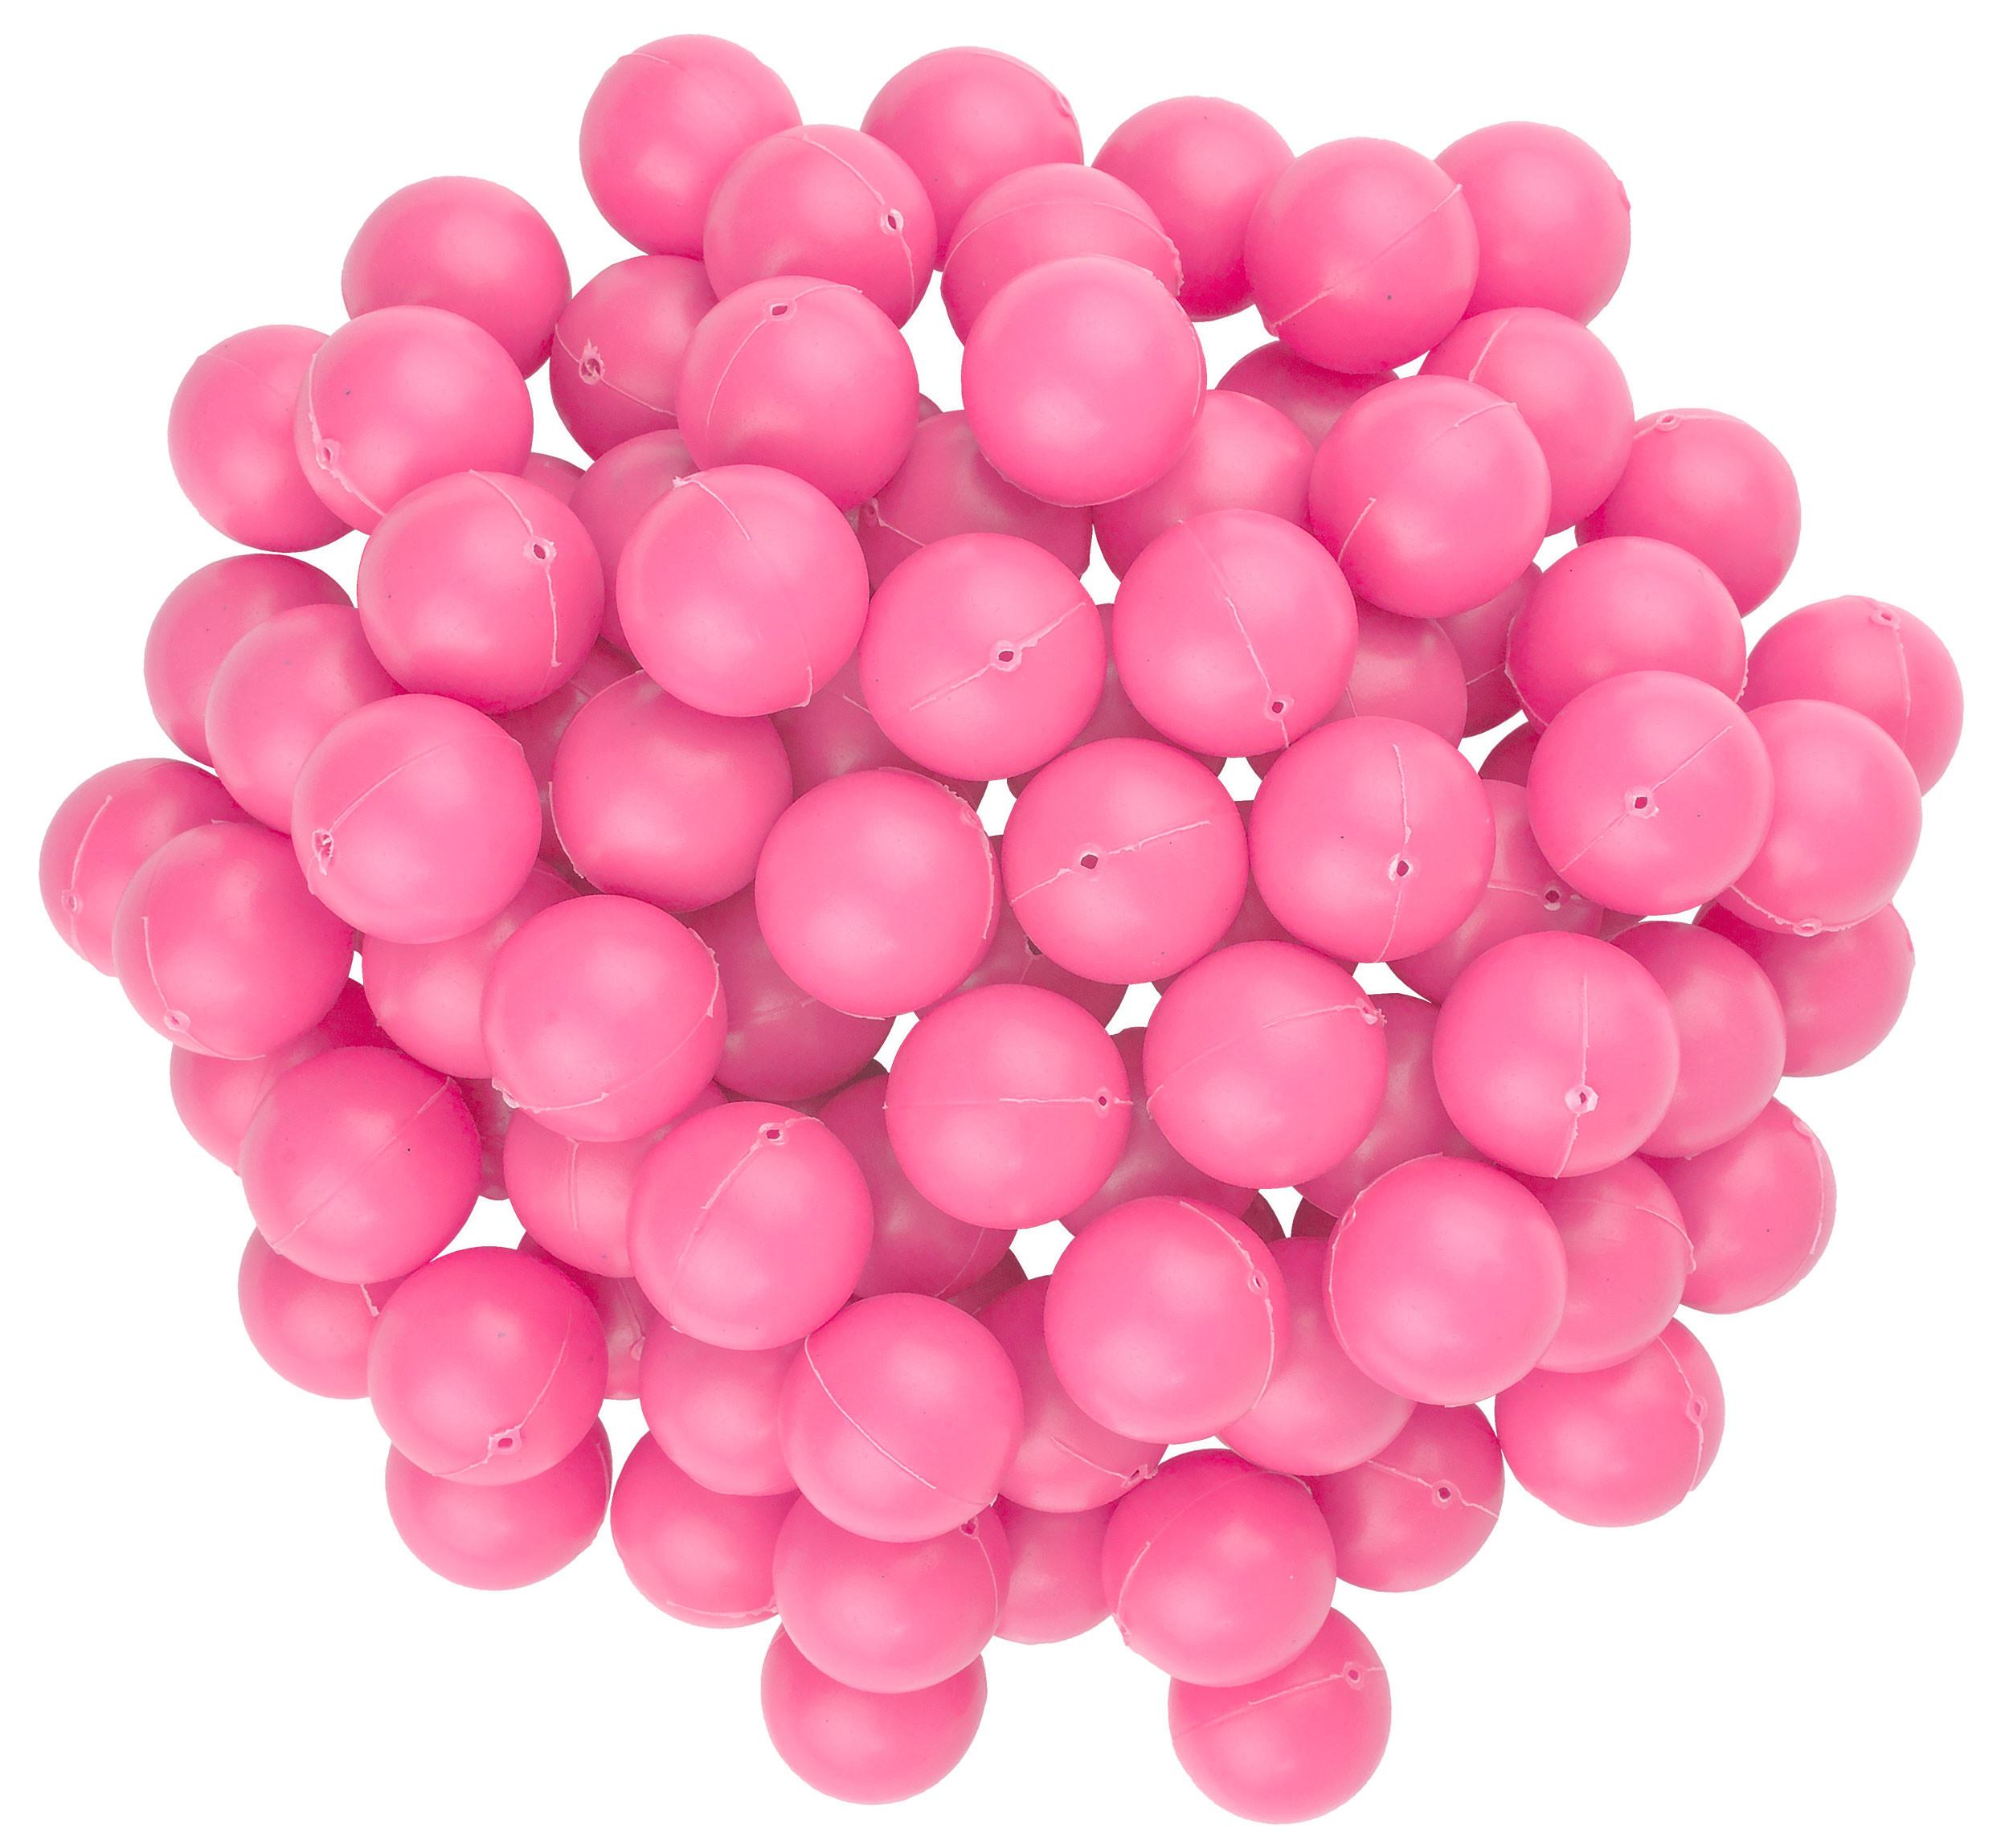 Pink Mini Beer Pong Balls